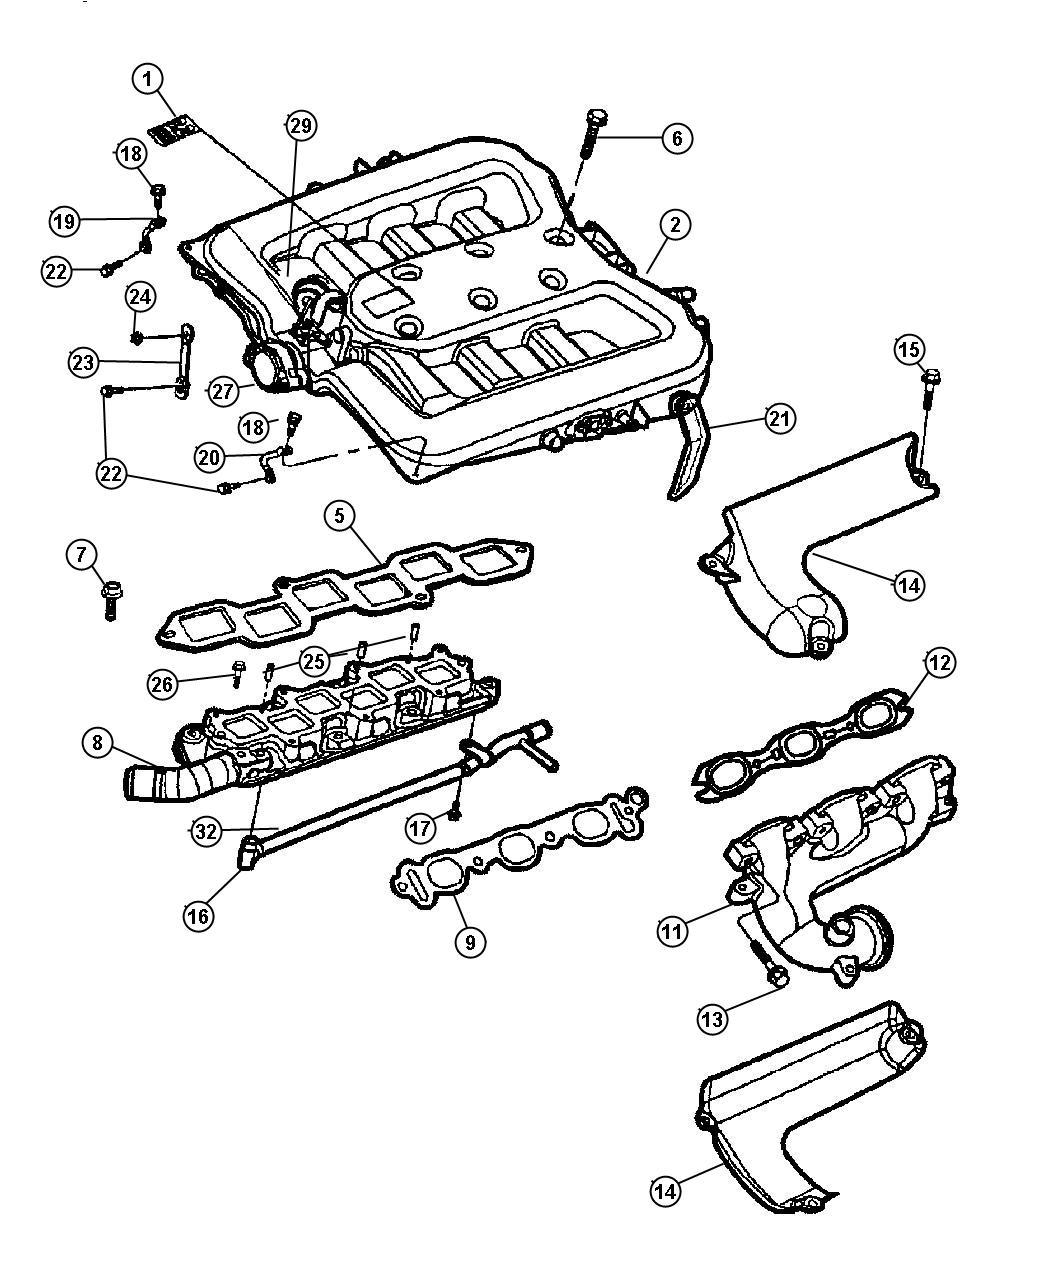 Chrysler 300 Actuator. Manifold tuning valve. Contains an